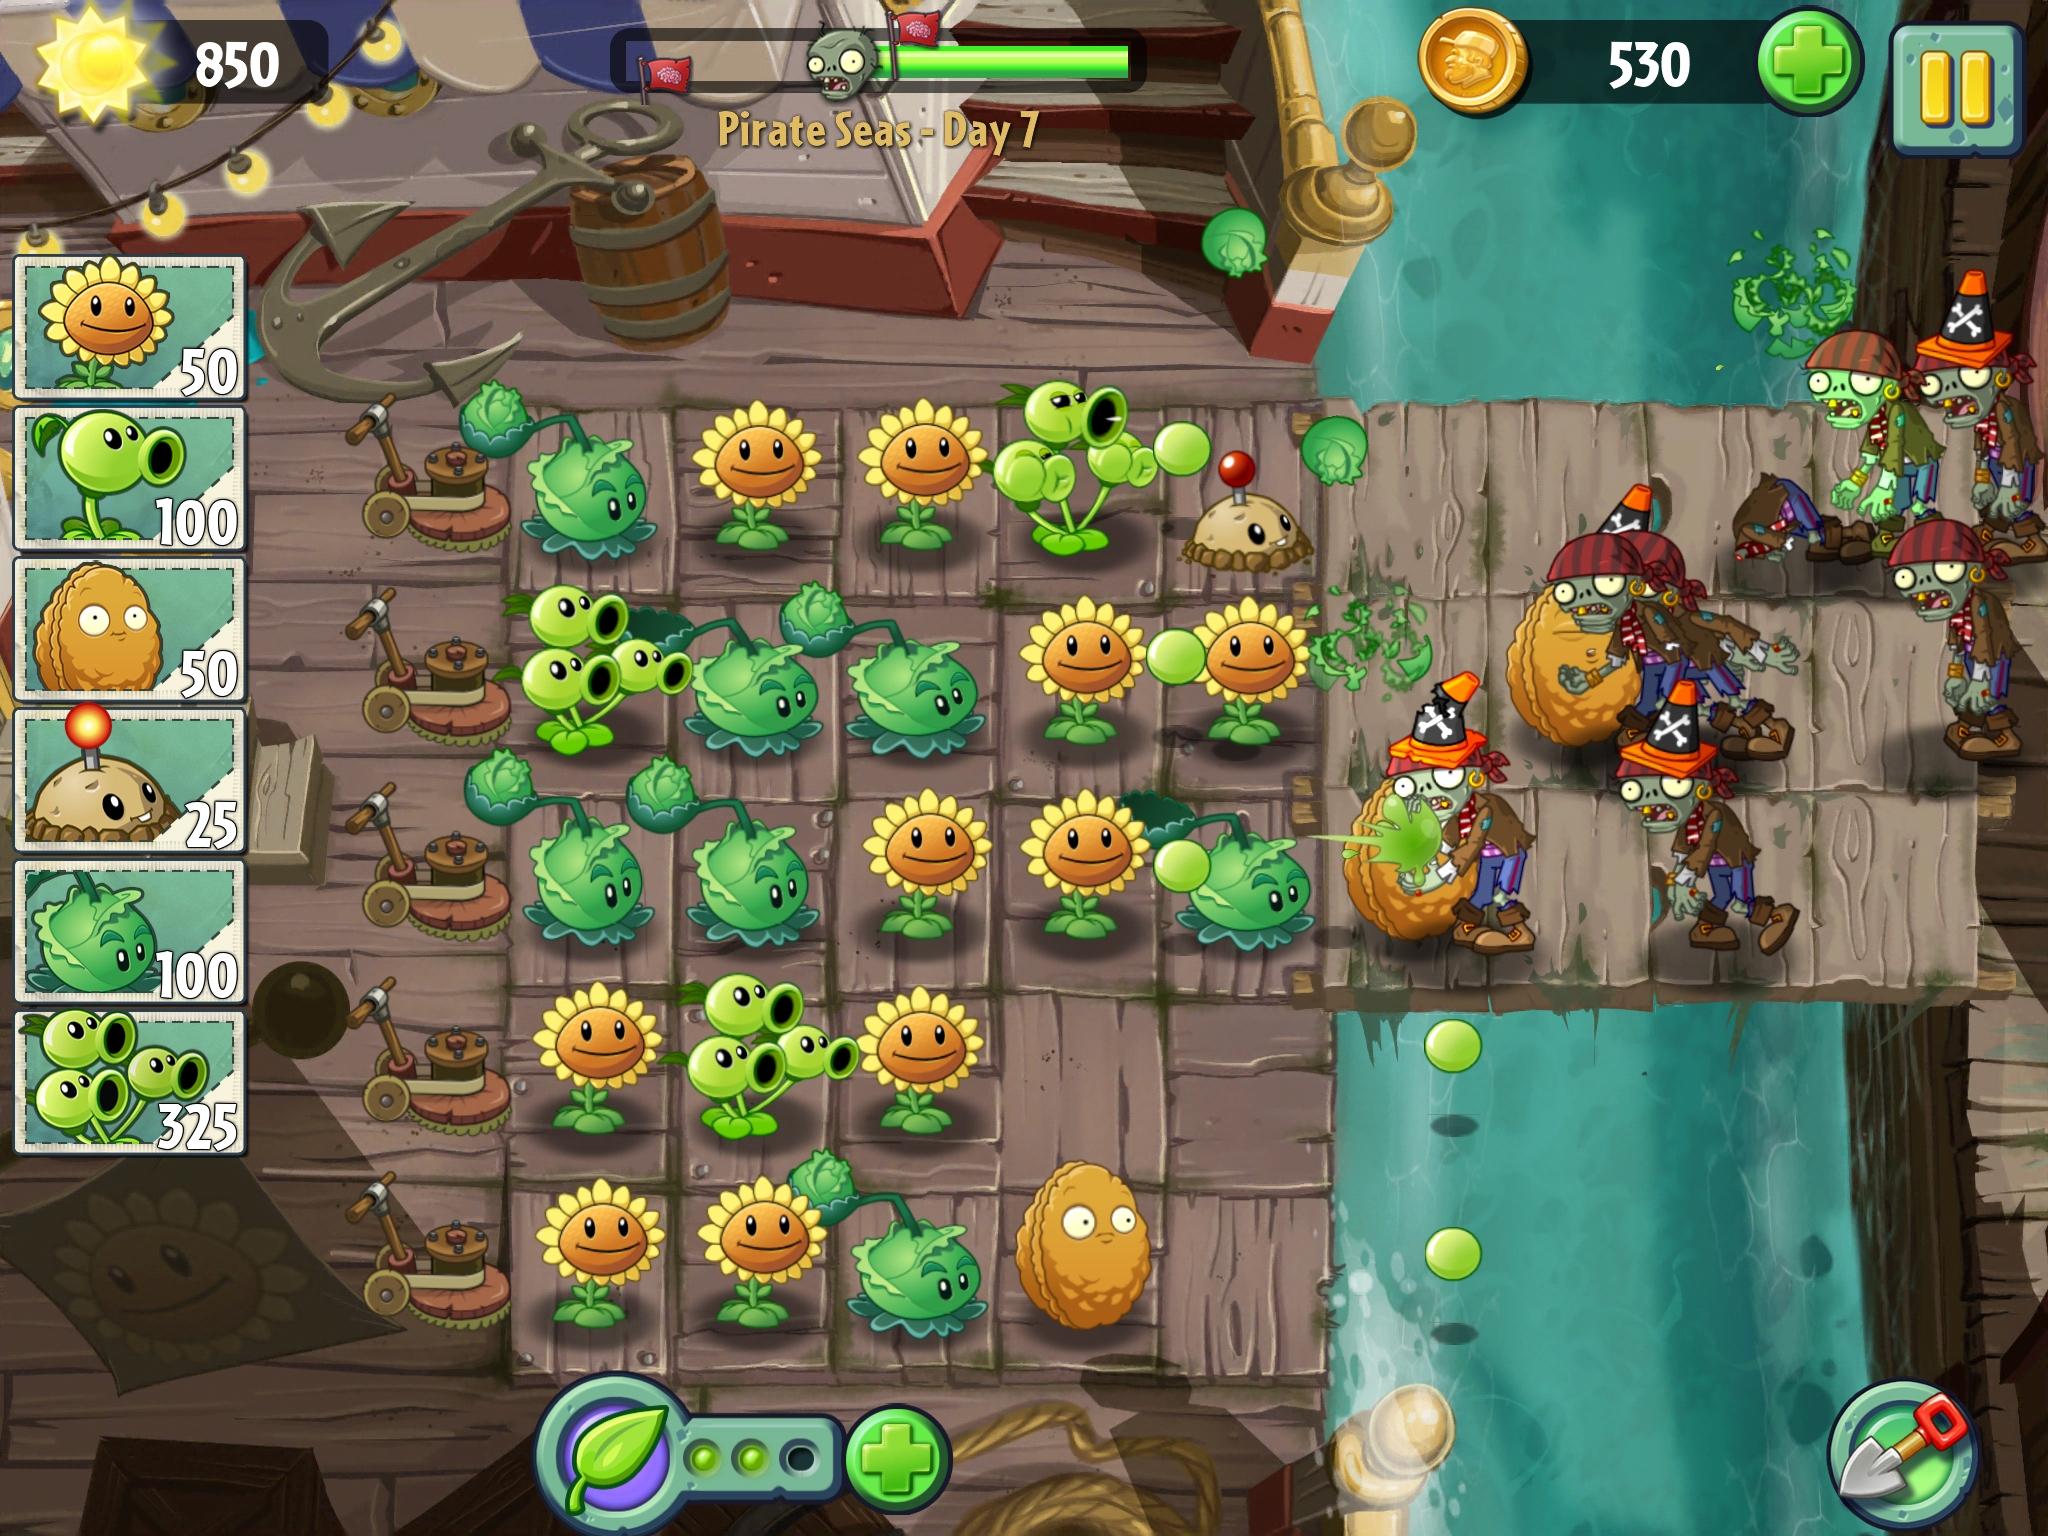 plants vs zombies 2 free download pc popcap games